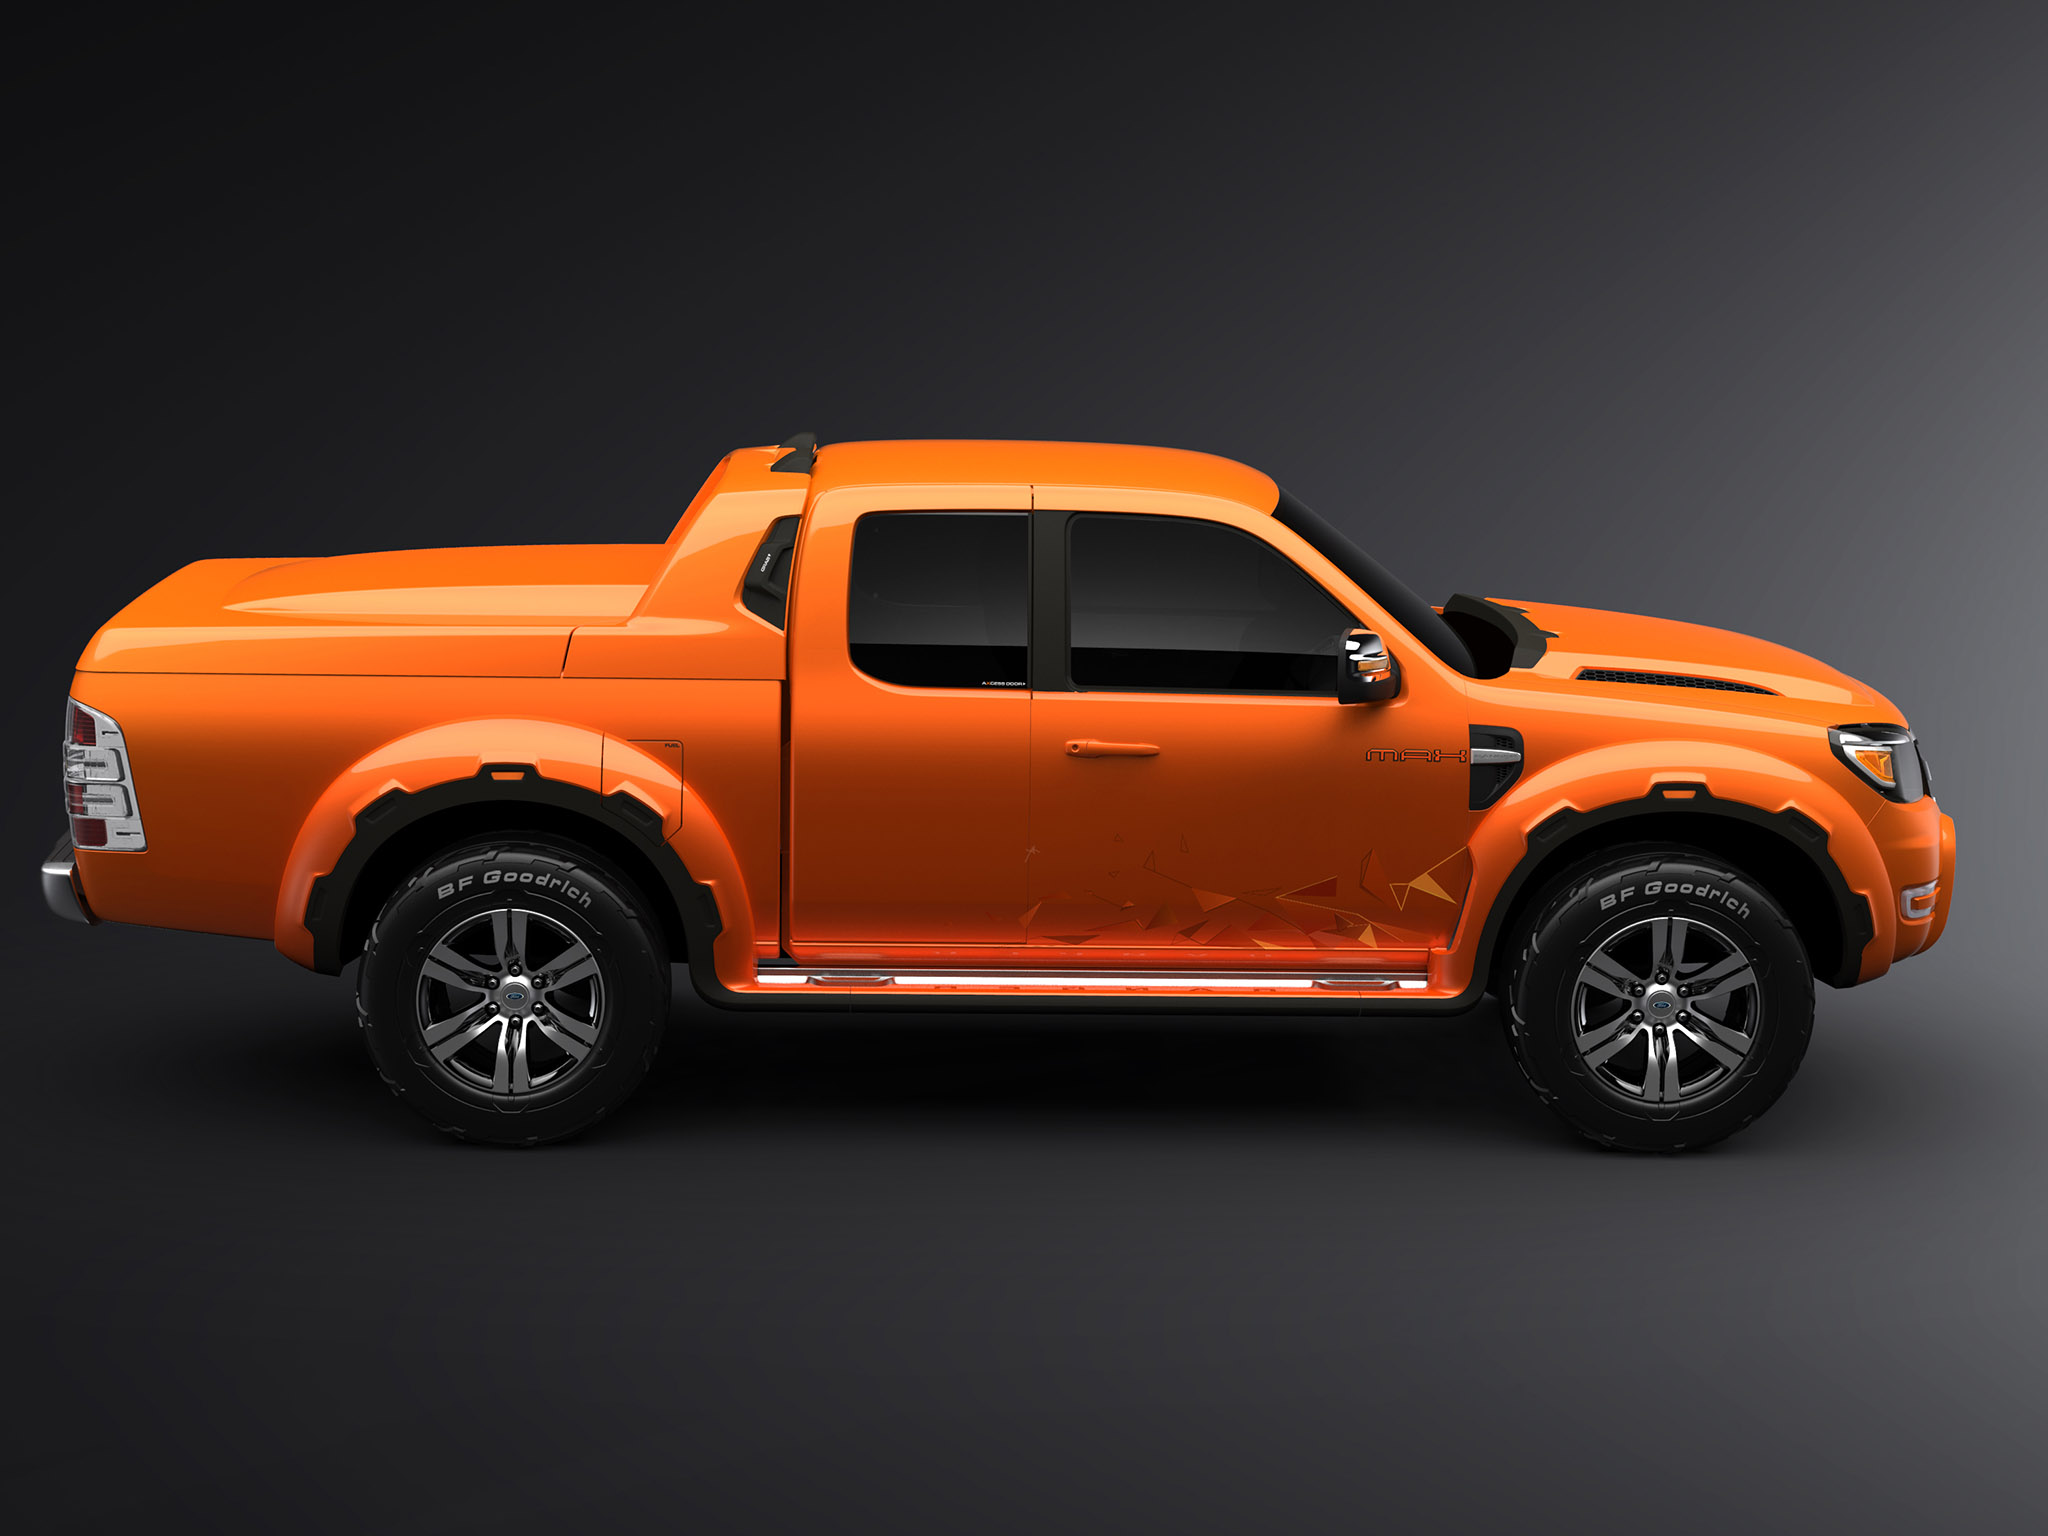 2008 Ford Ranger Max Concept truck 4x4 wallpaper ...